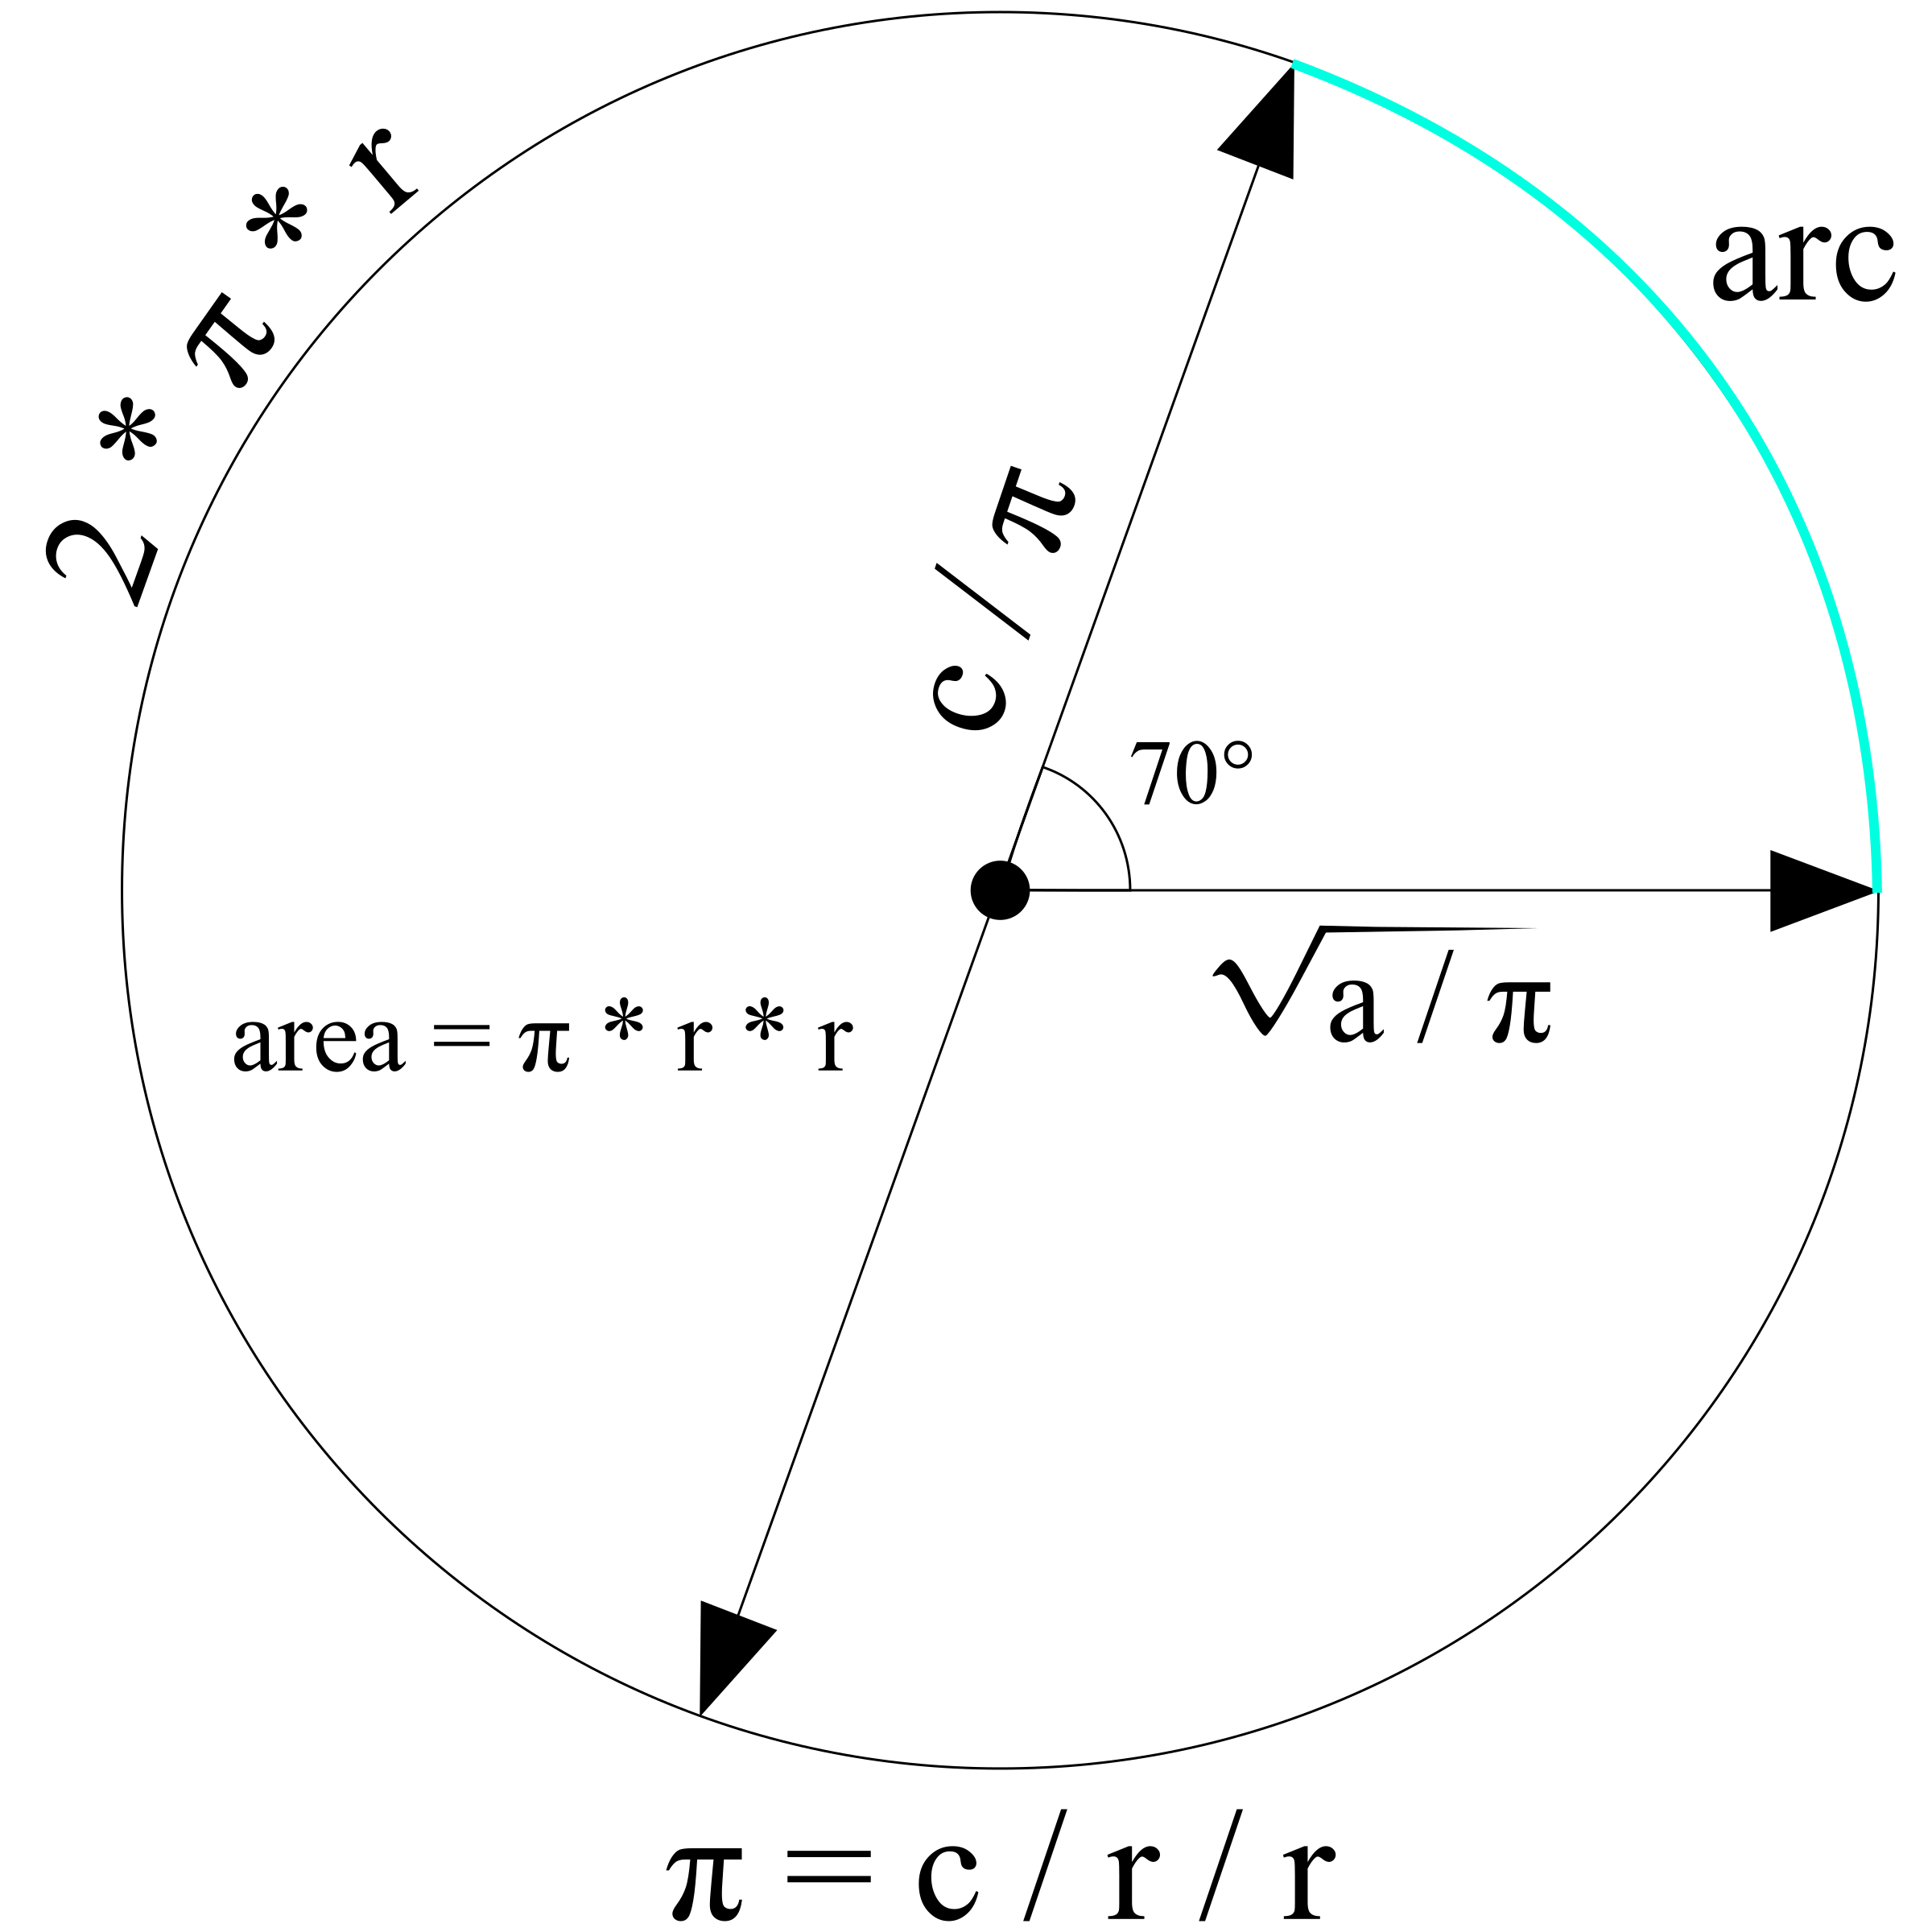 Einstein clipart formula. Circle formulas big image